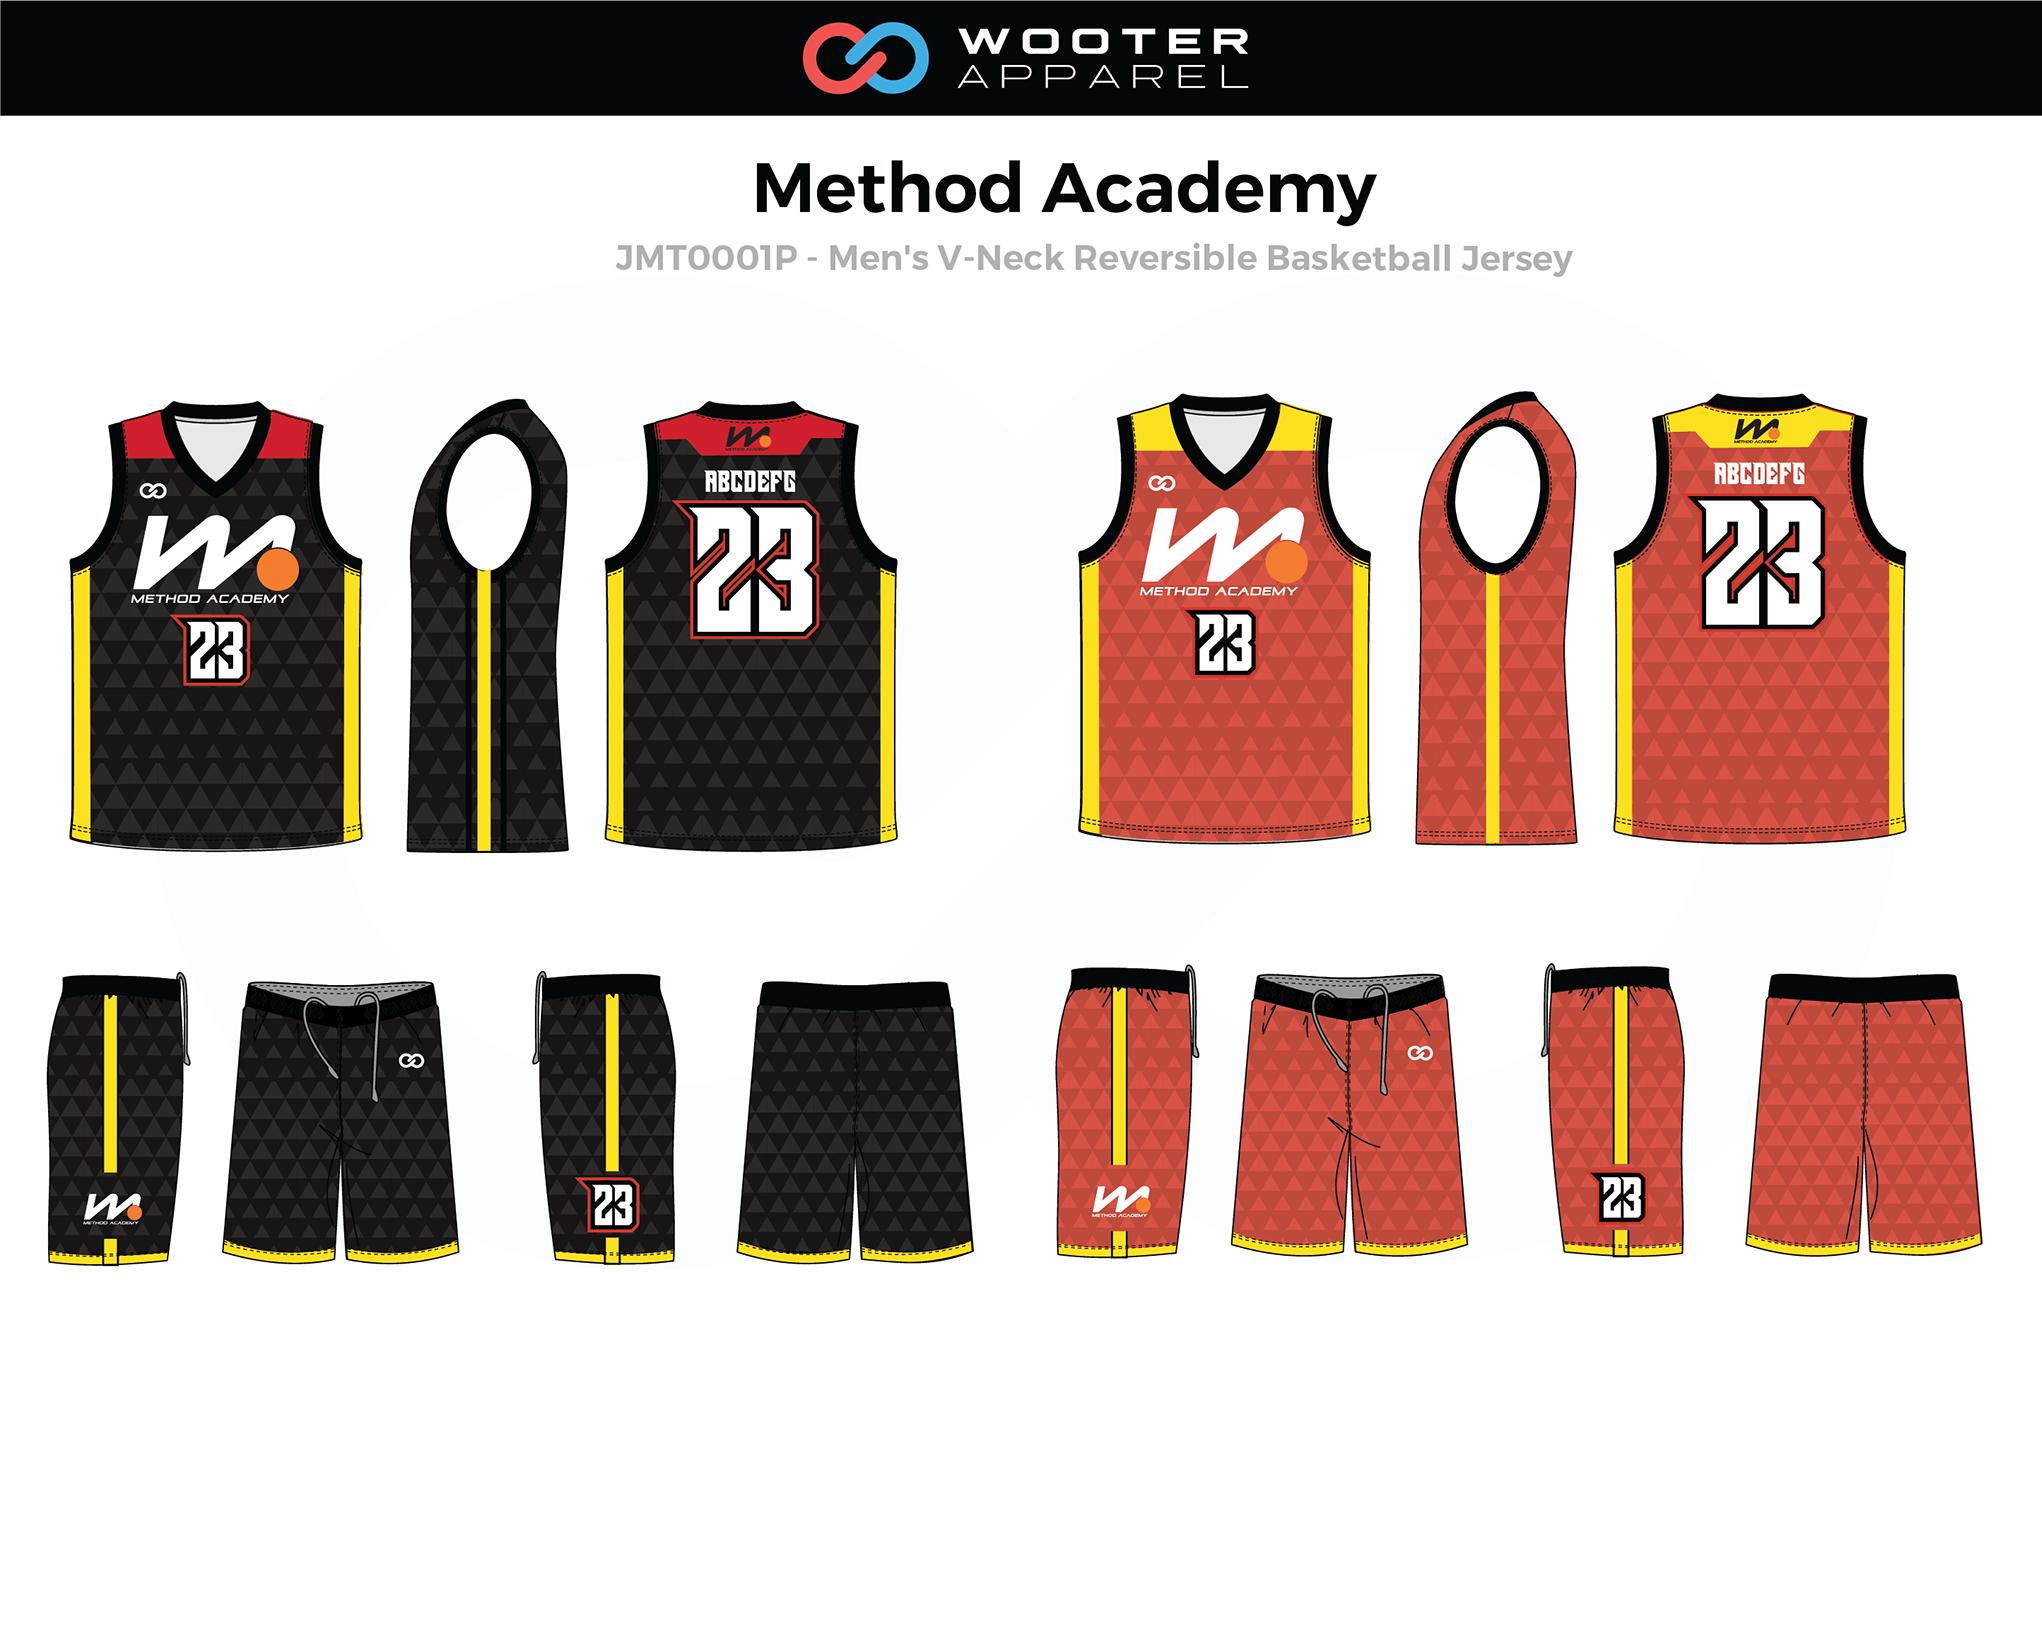 METHOD ACADEMY Orange Black Yellow White Men's Basketball V-Neck Reversible Jersey and Shorts